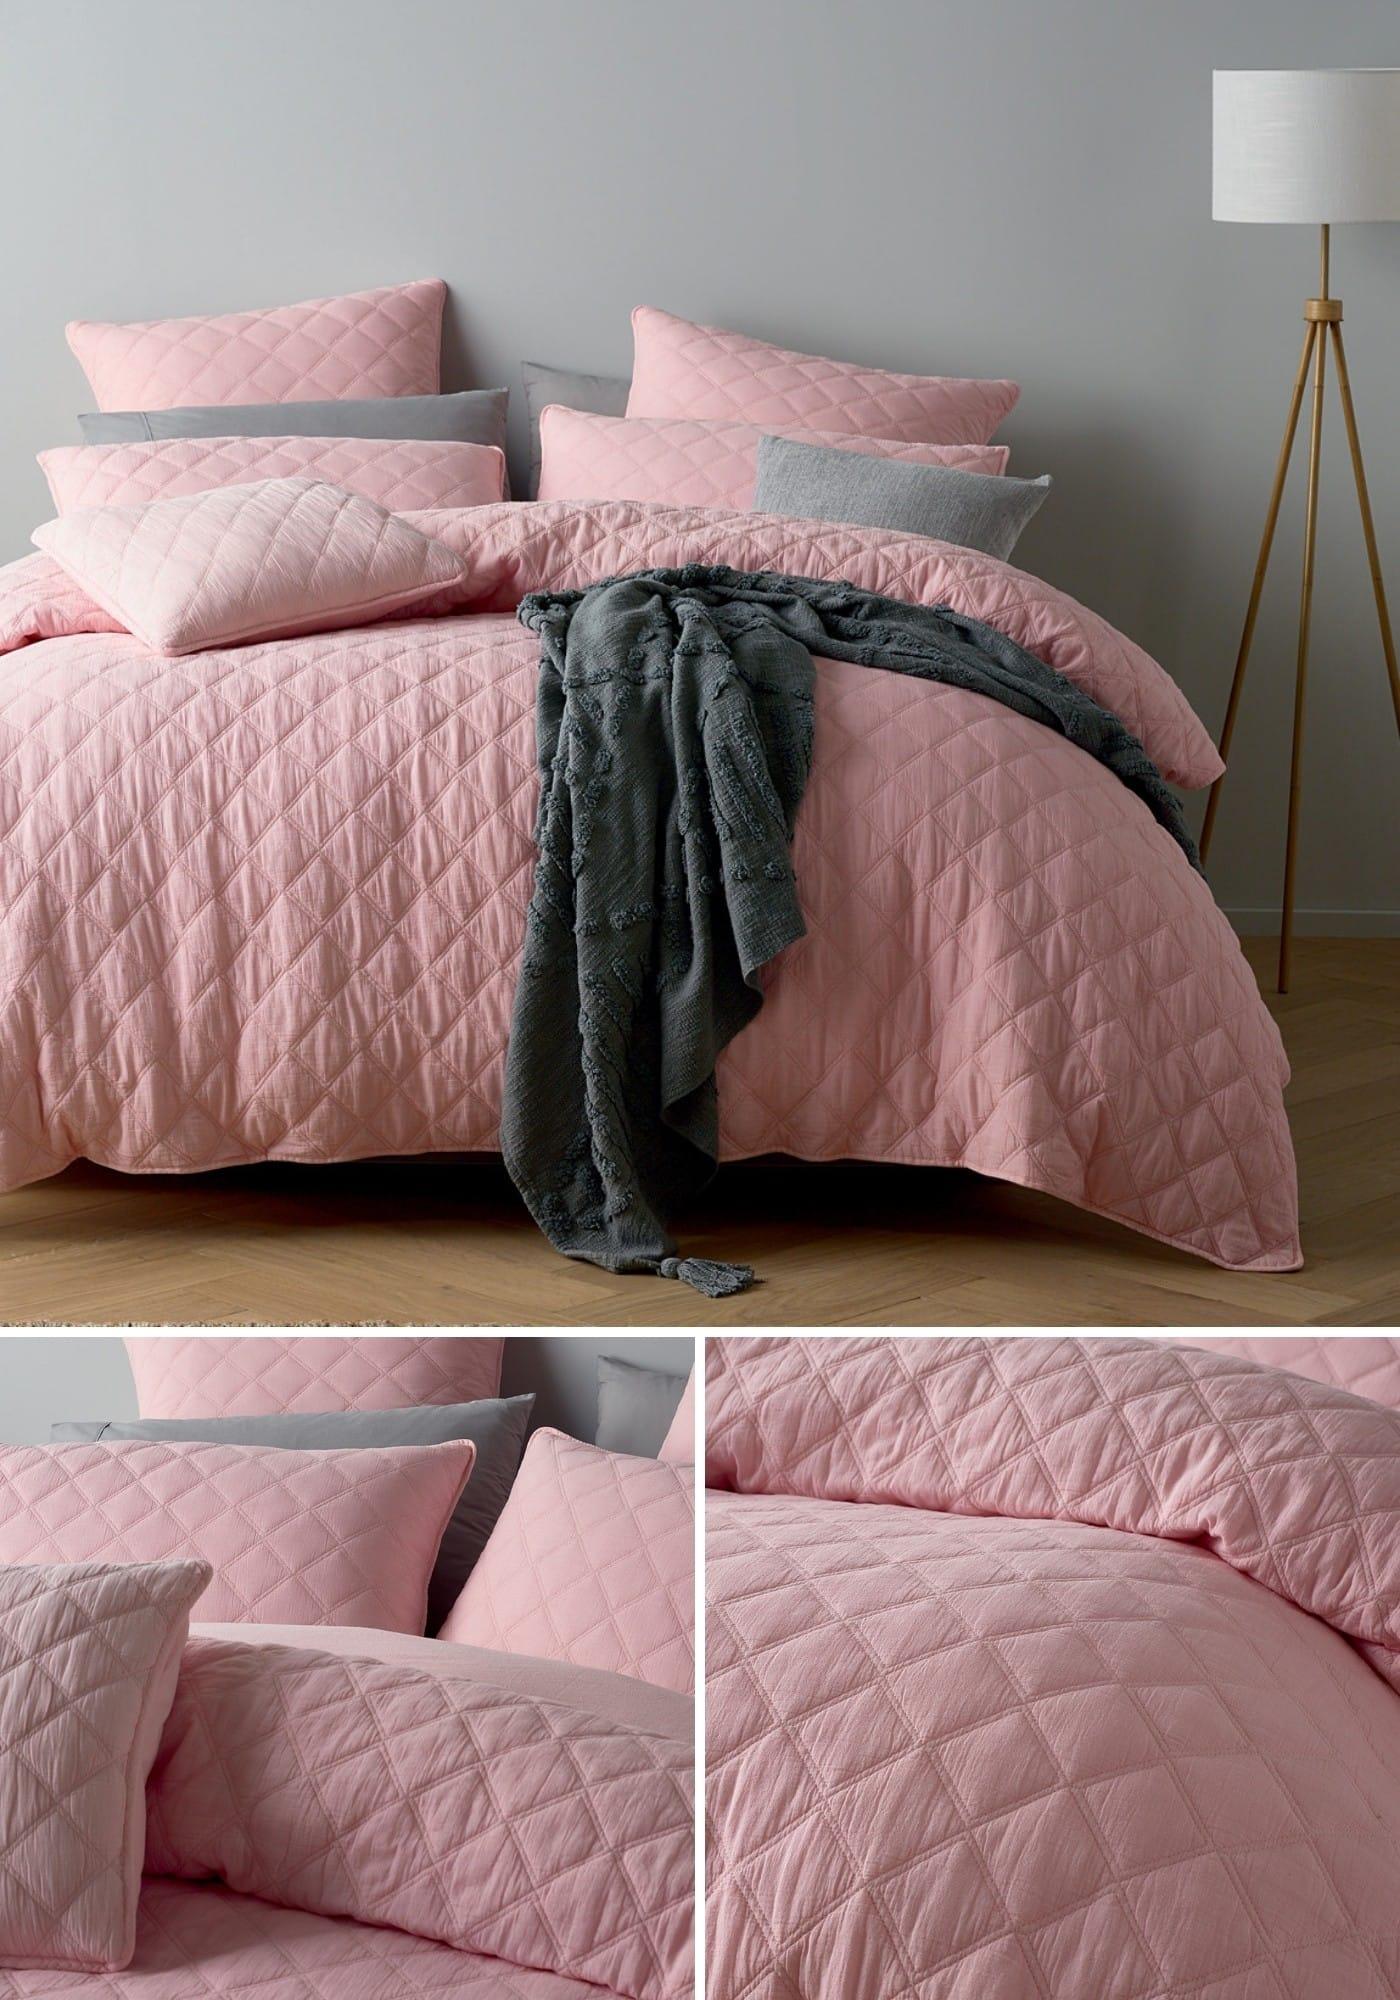 lorraine lea austin quilt cover set pink stitch bedding summer quilt covers